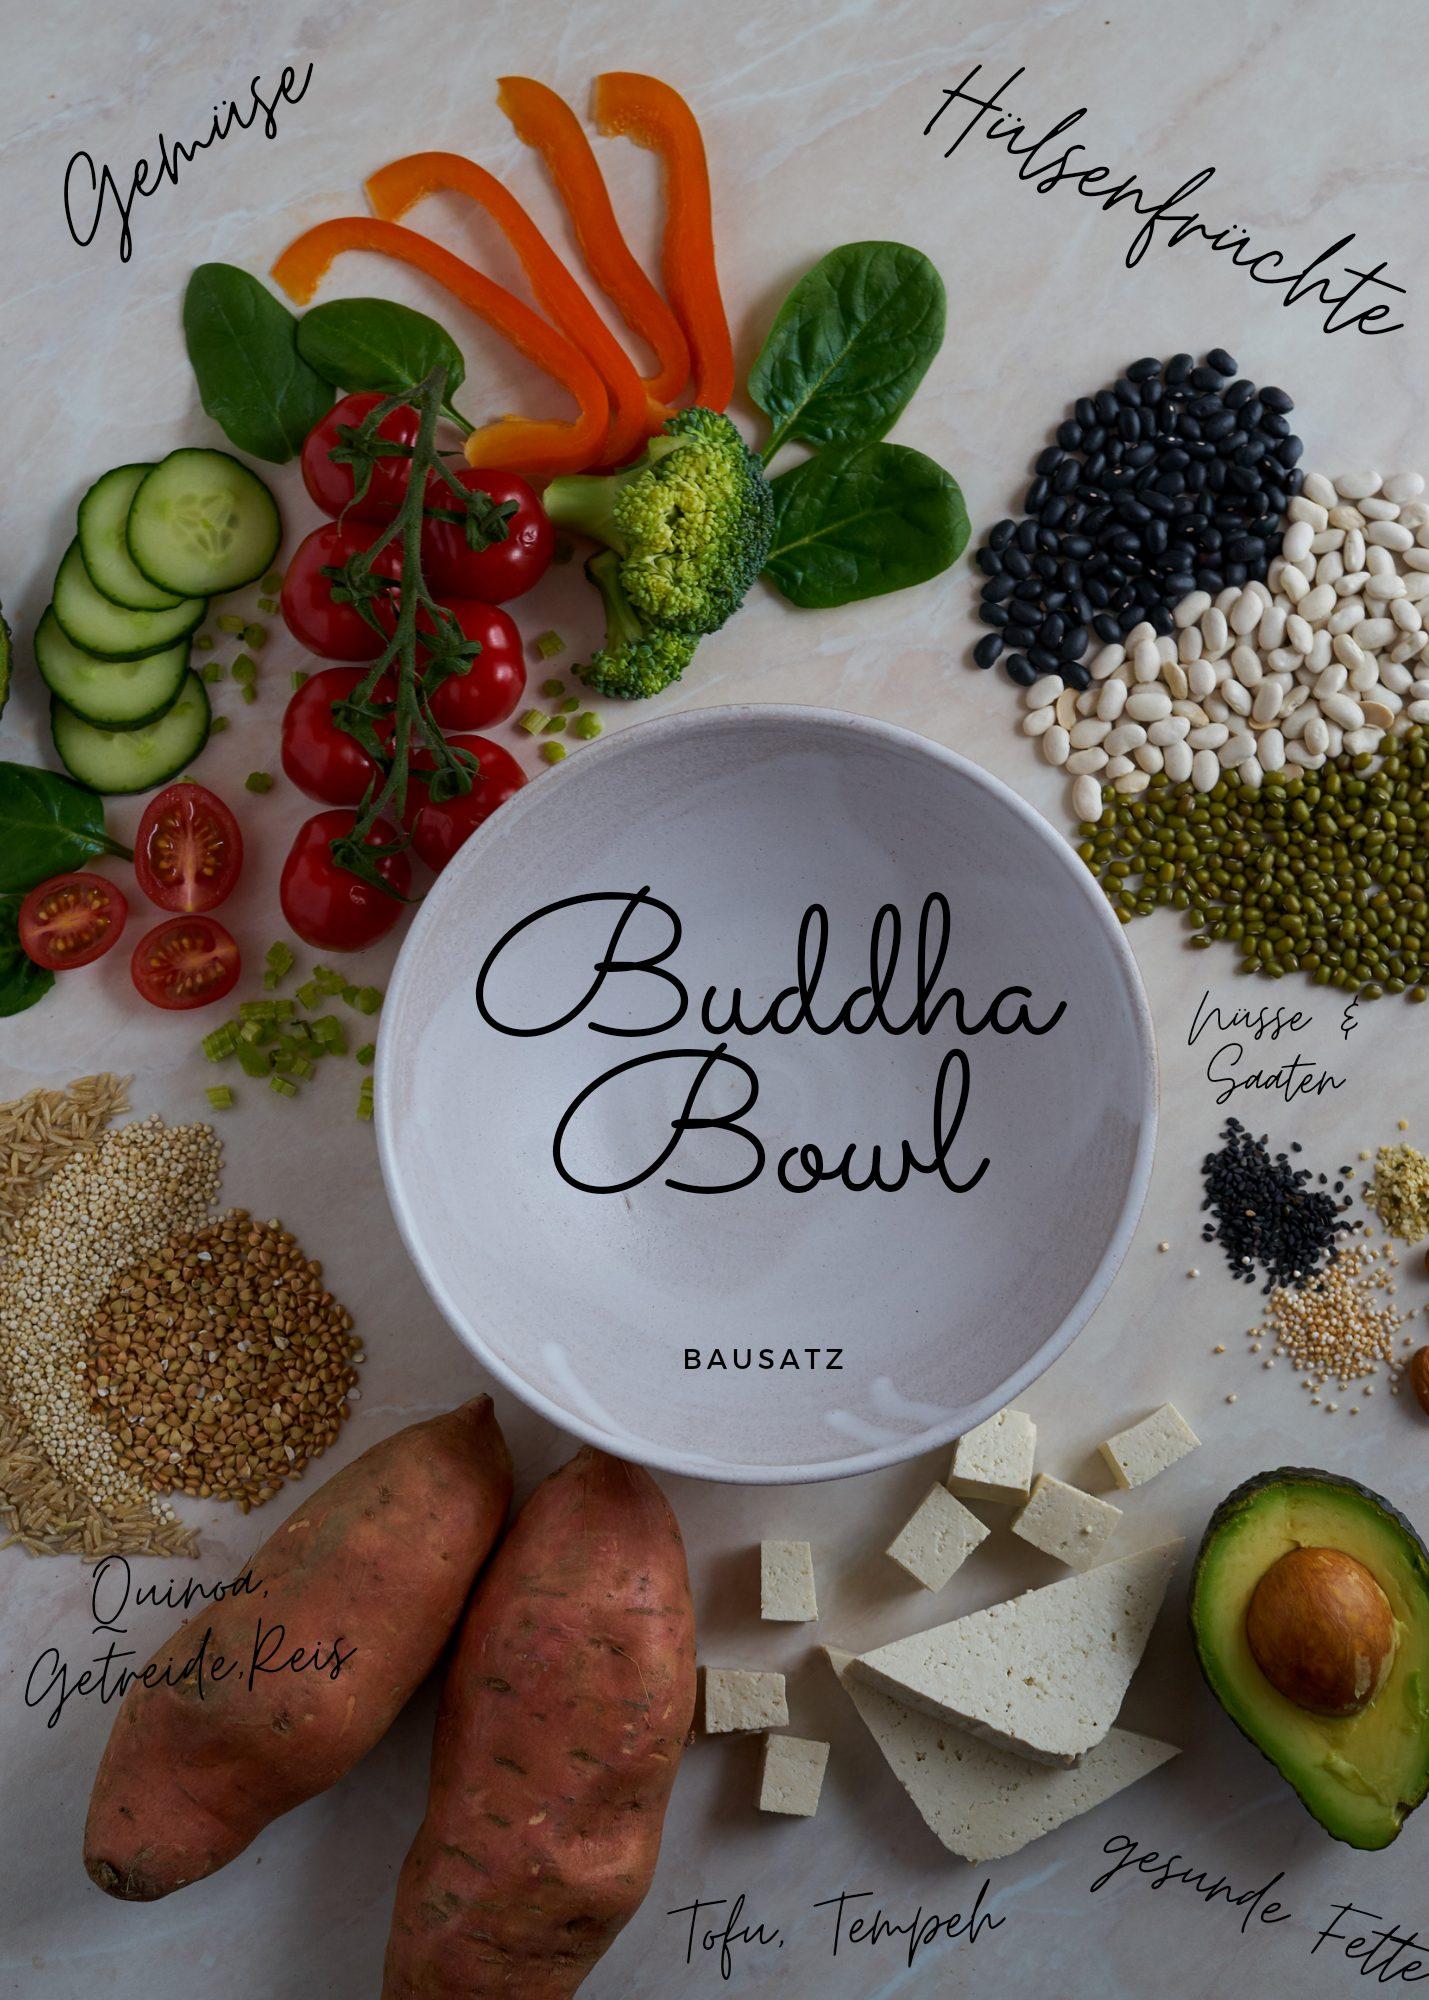 Bausatz-Buddha-Bowl